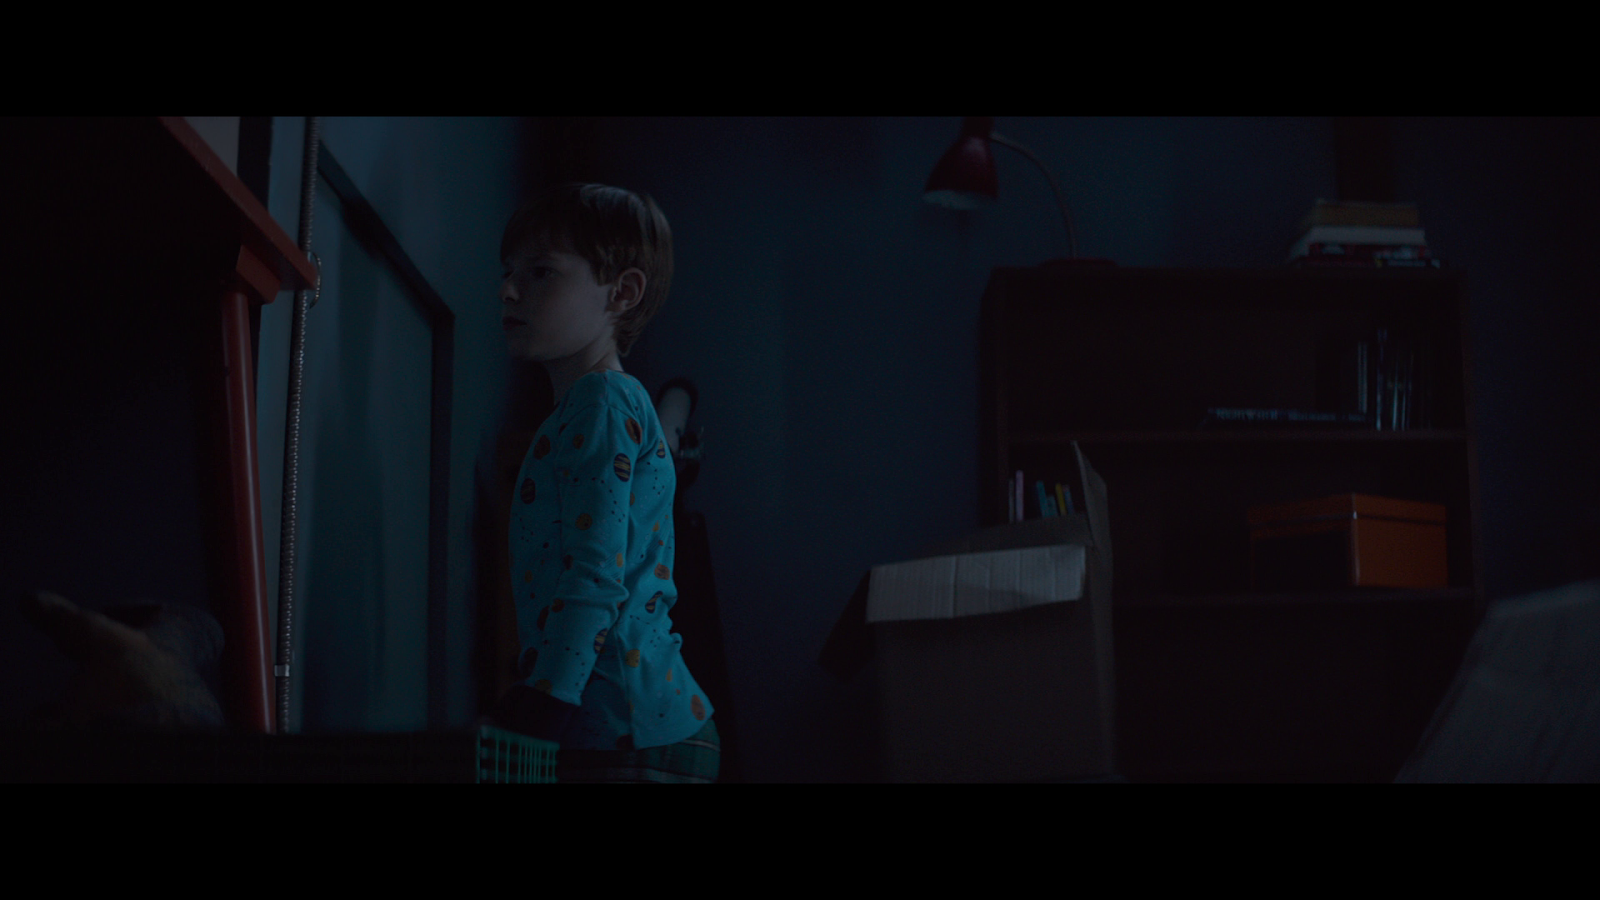 Poltergeist (2015) 1080p BD25 2D y 3D 3